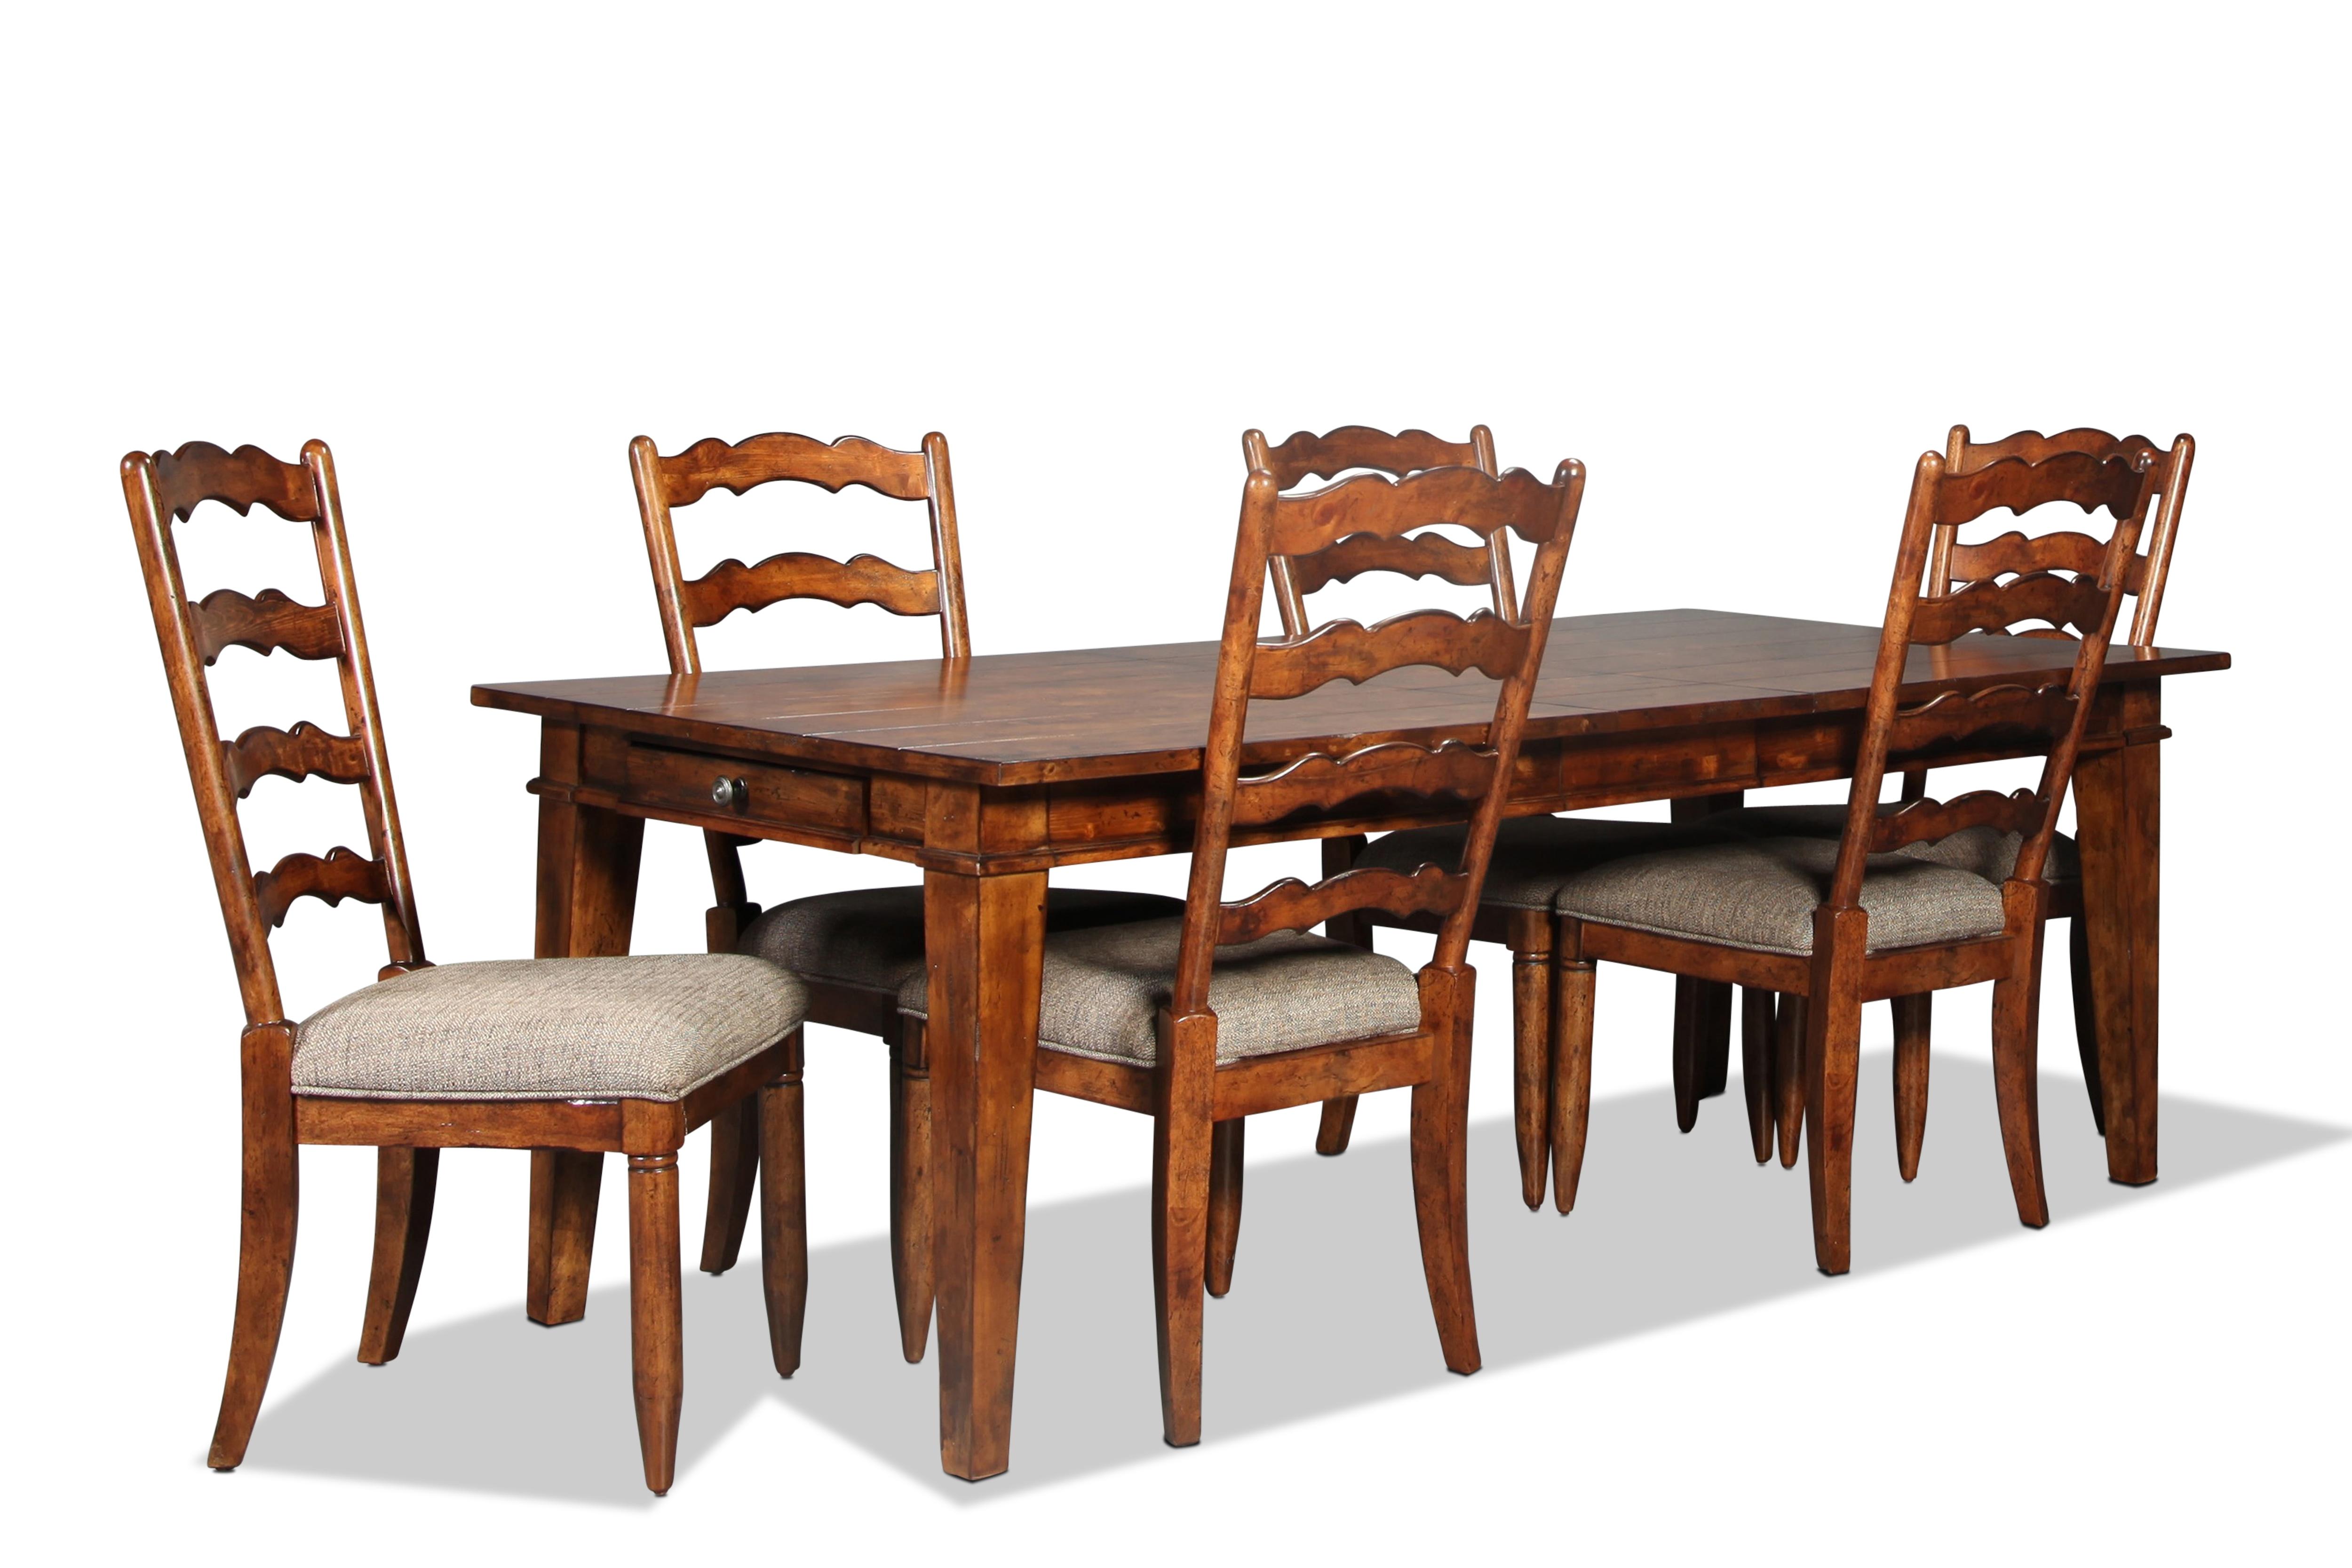 pine dining room set bennington pine dining room set pine dining room furniture the beauty and charm with